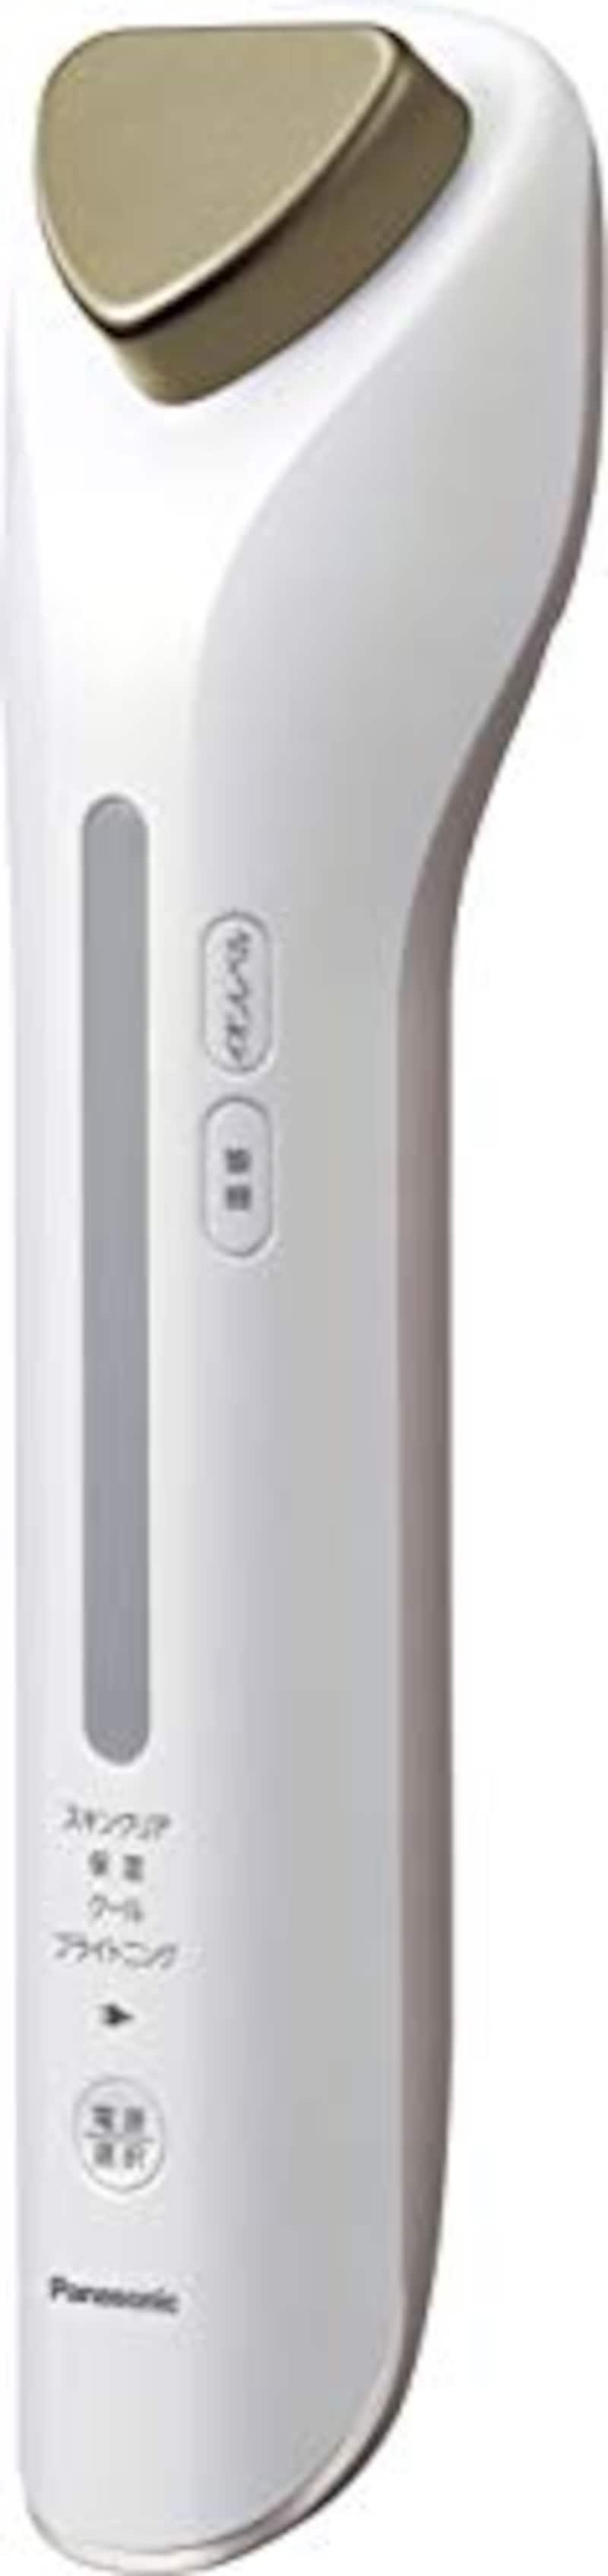 Panasonic(パナソニック),美顔器 イオンエフェクター クールモード付き 浸透タイプ,EH-ST78-N